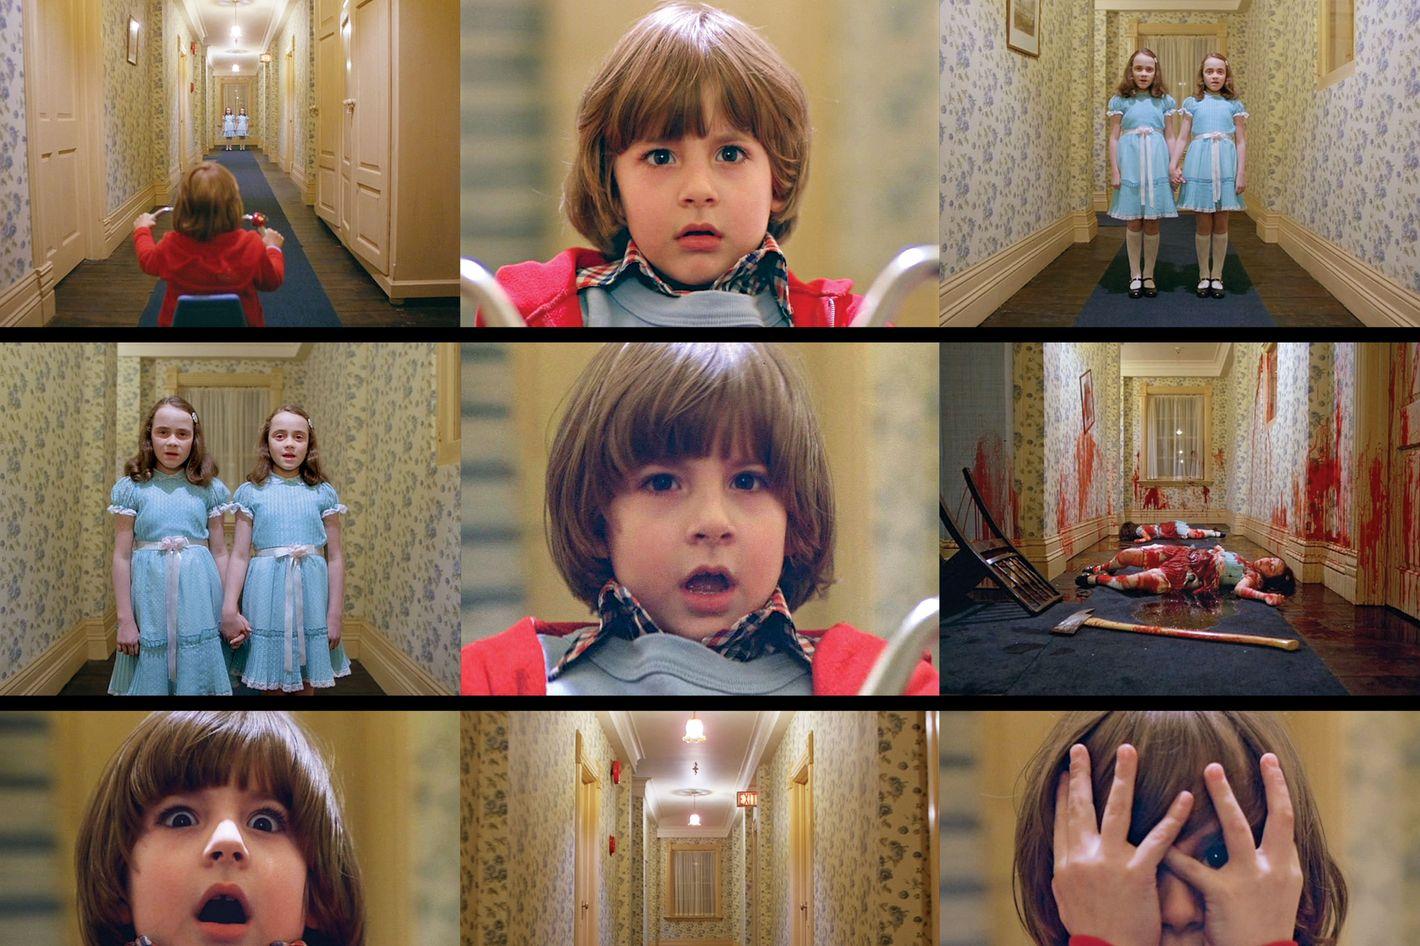 The Shining/The Sixth Sense.